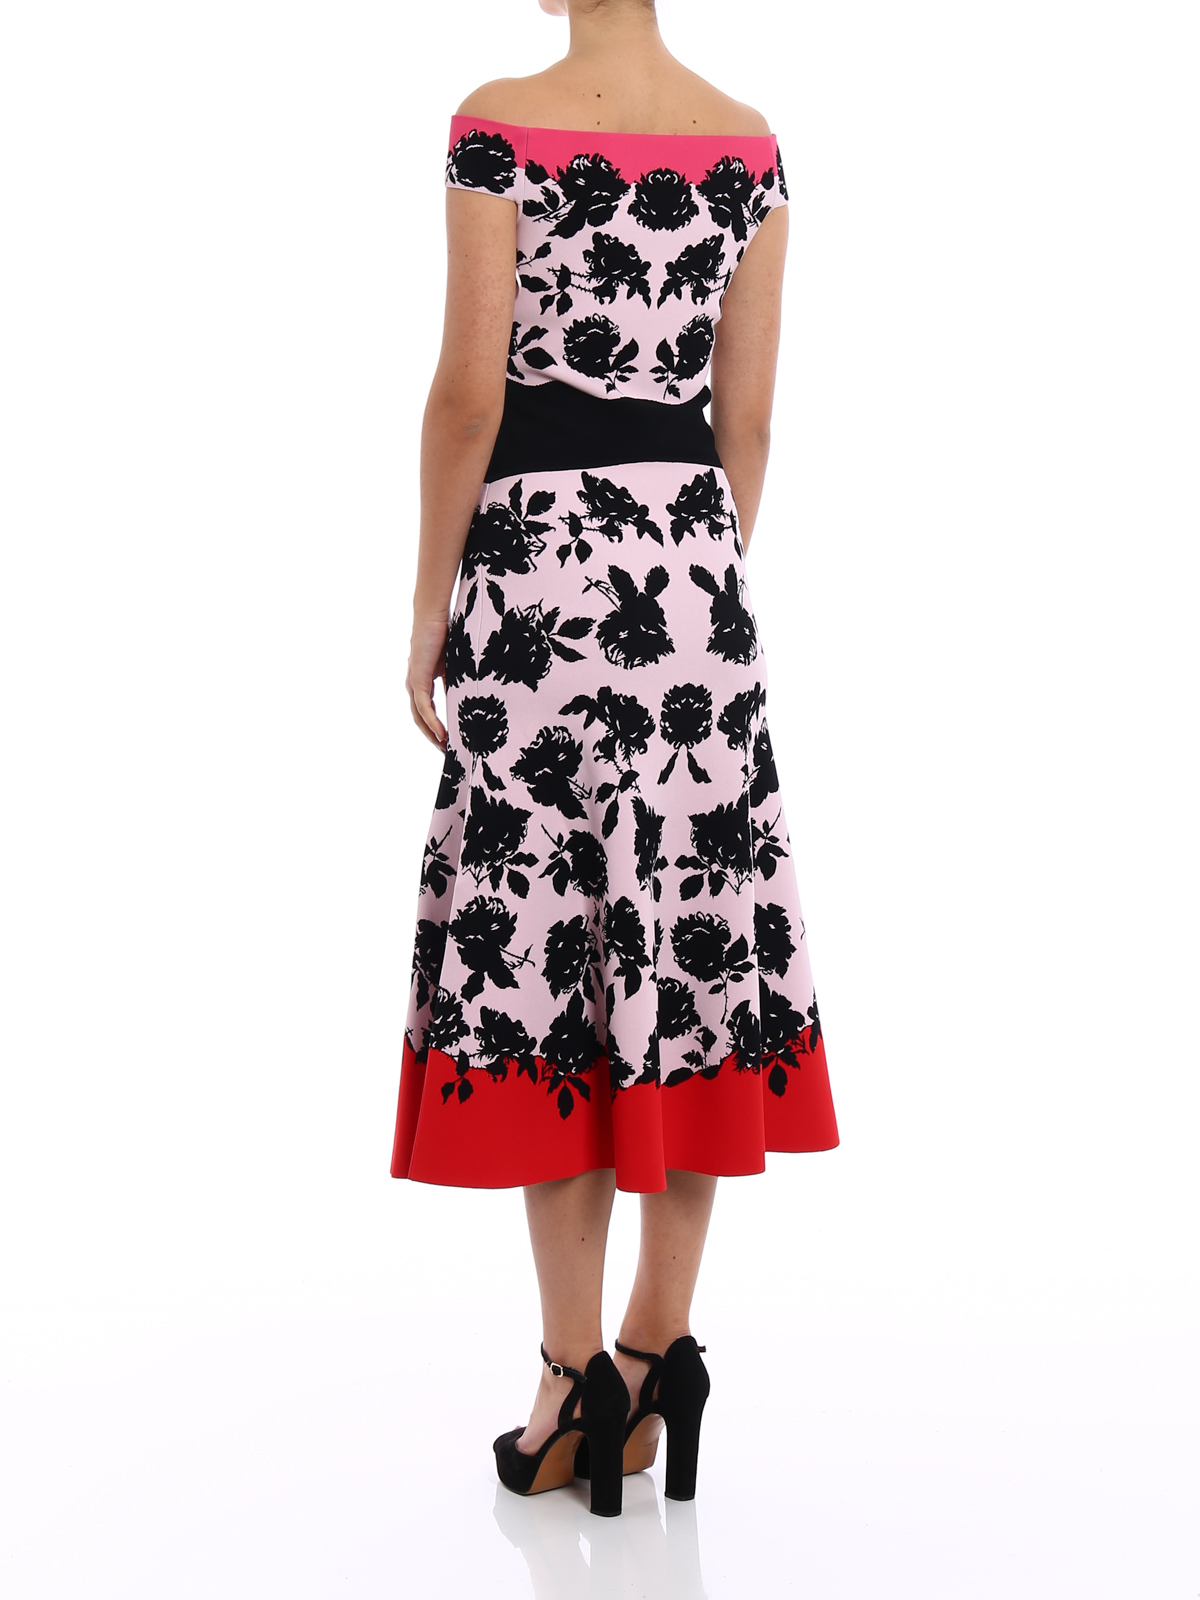 jacquard dress - Multicolour Alexander McQueen Outlet Best Outlet Ebay Factory Outlet Cheap Online GkuUikfK